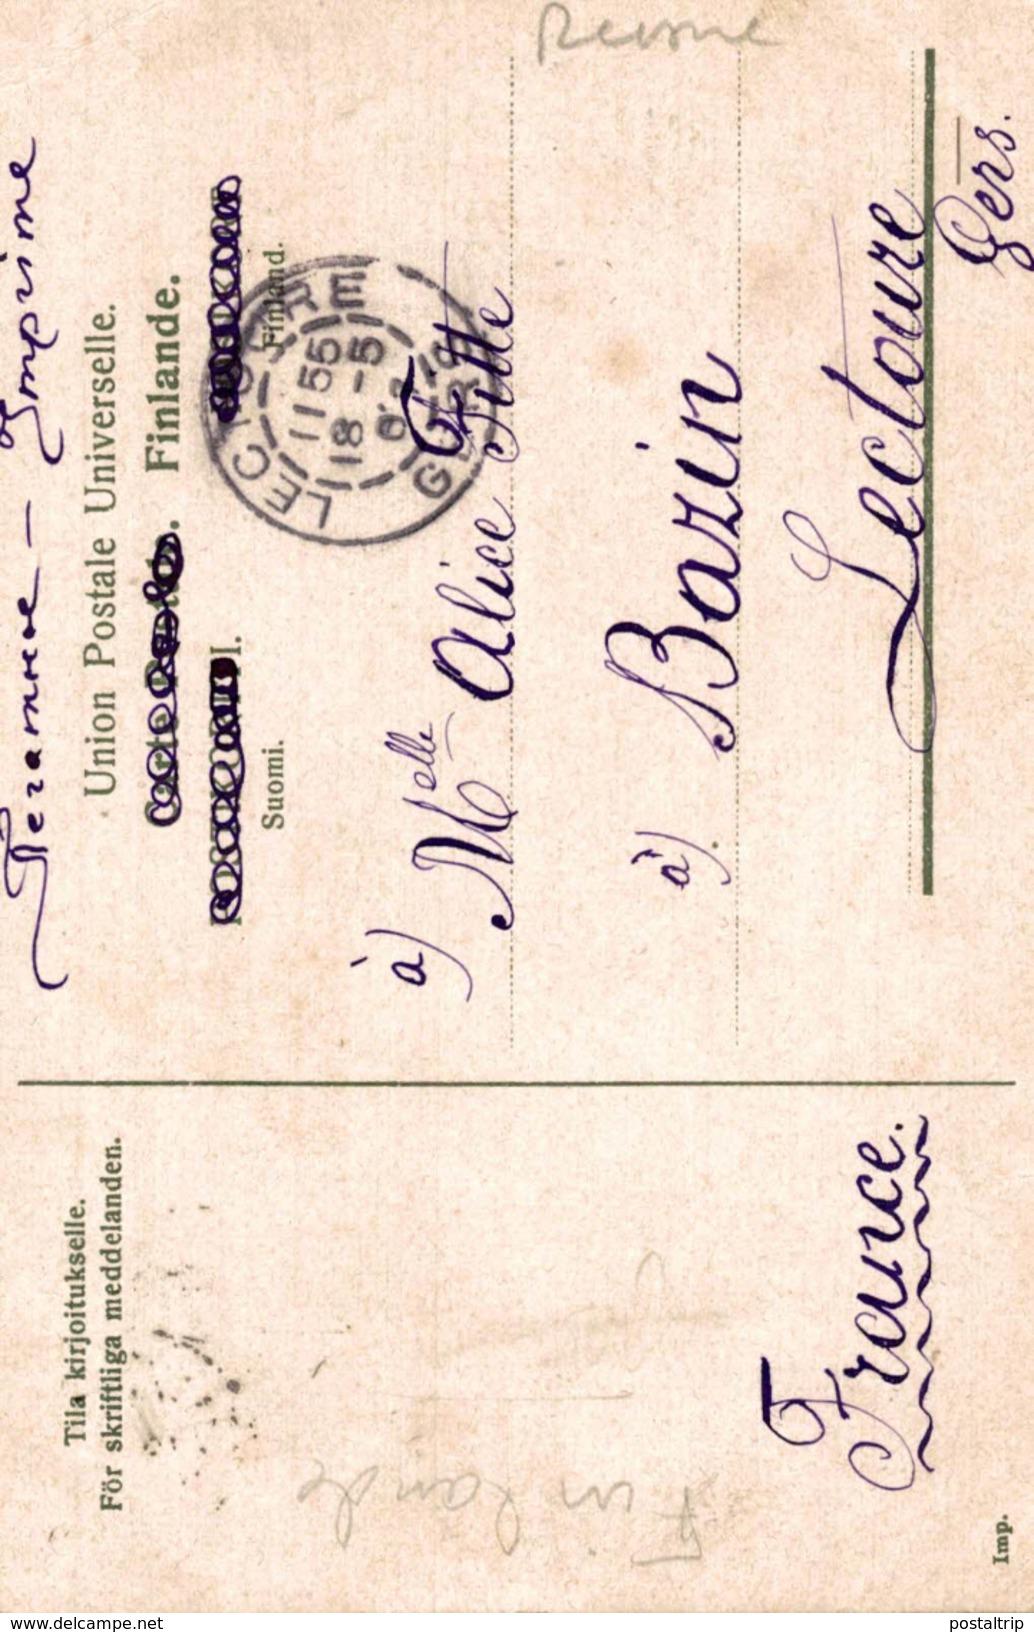 LAPINMAA LAPPLAND 1907  TILA KIRJOITUKSELLE FOR SKRIFTLIGA MEDDELANDEN - Finlandia